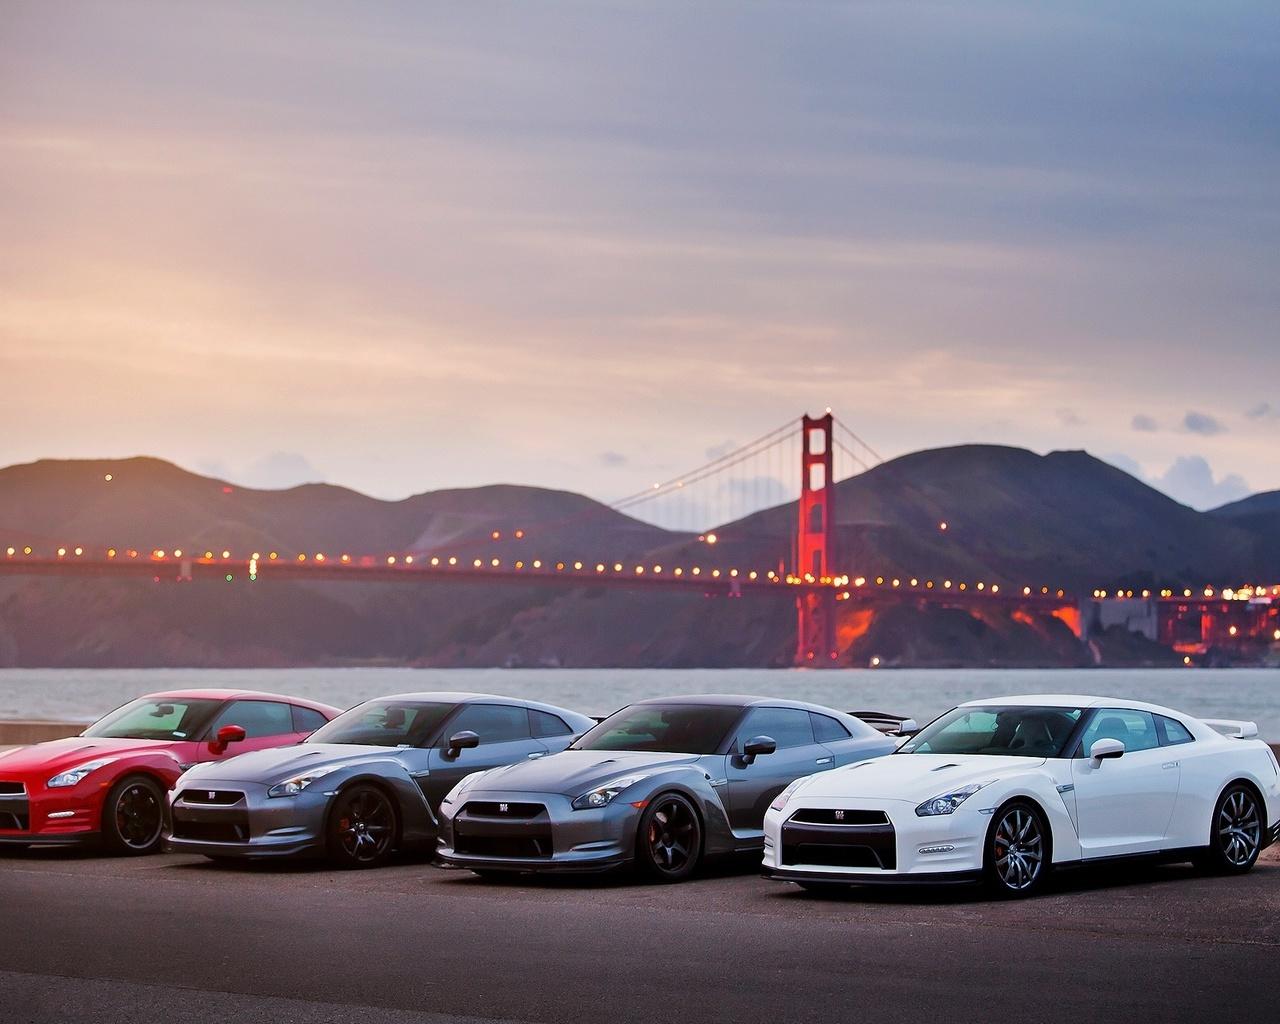 город, мост, паркинг, суперкар, ниссан, спорткар, мост, сан франциско, горы, вечер, красиво